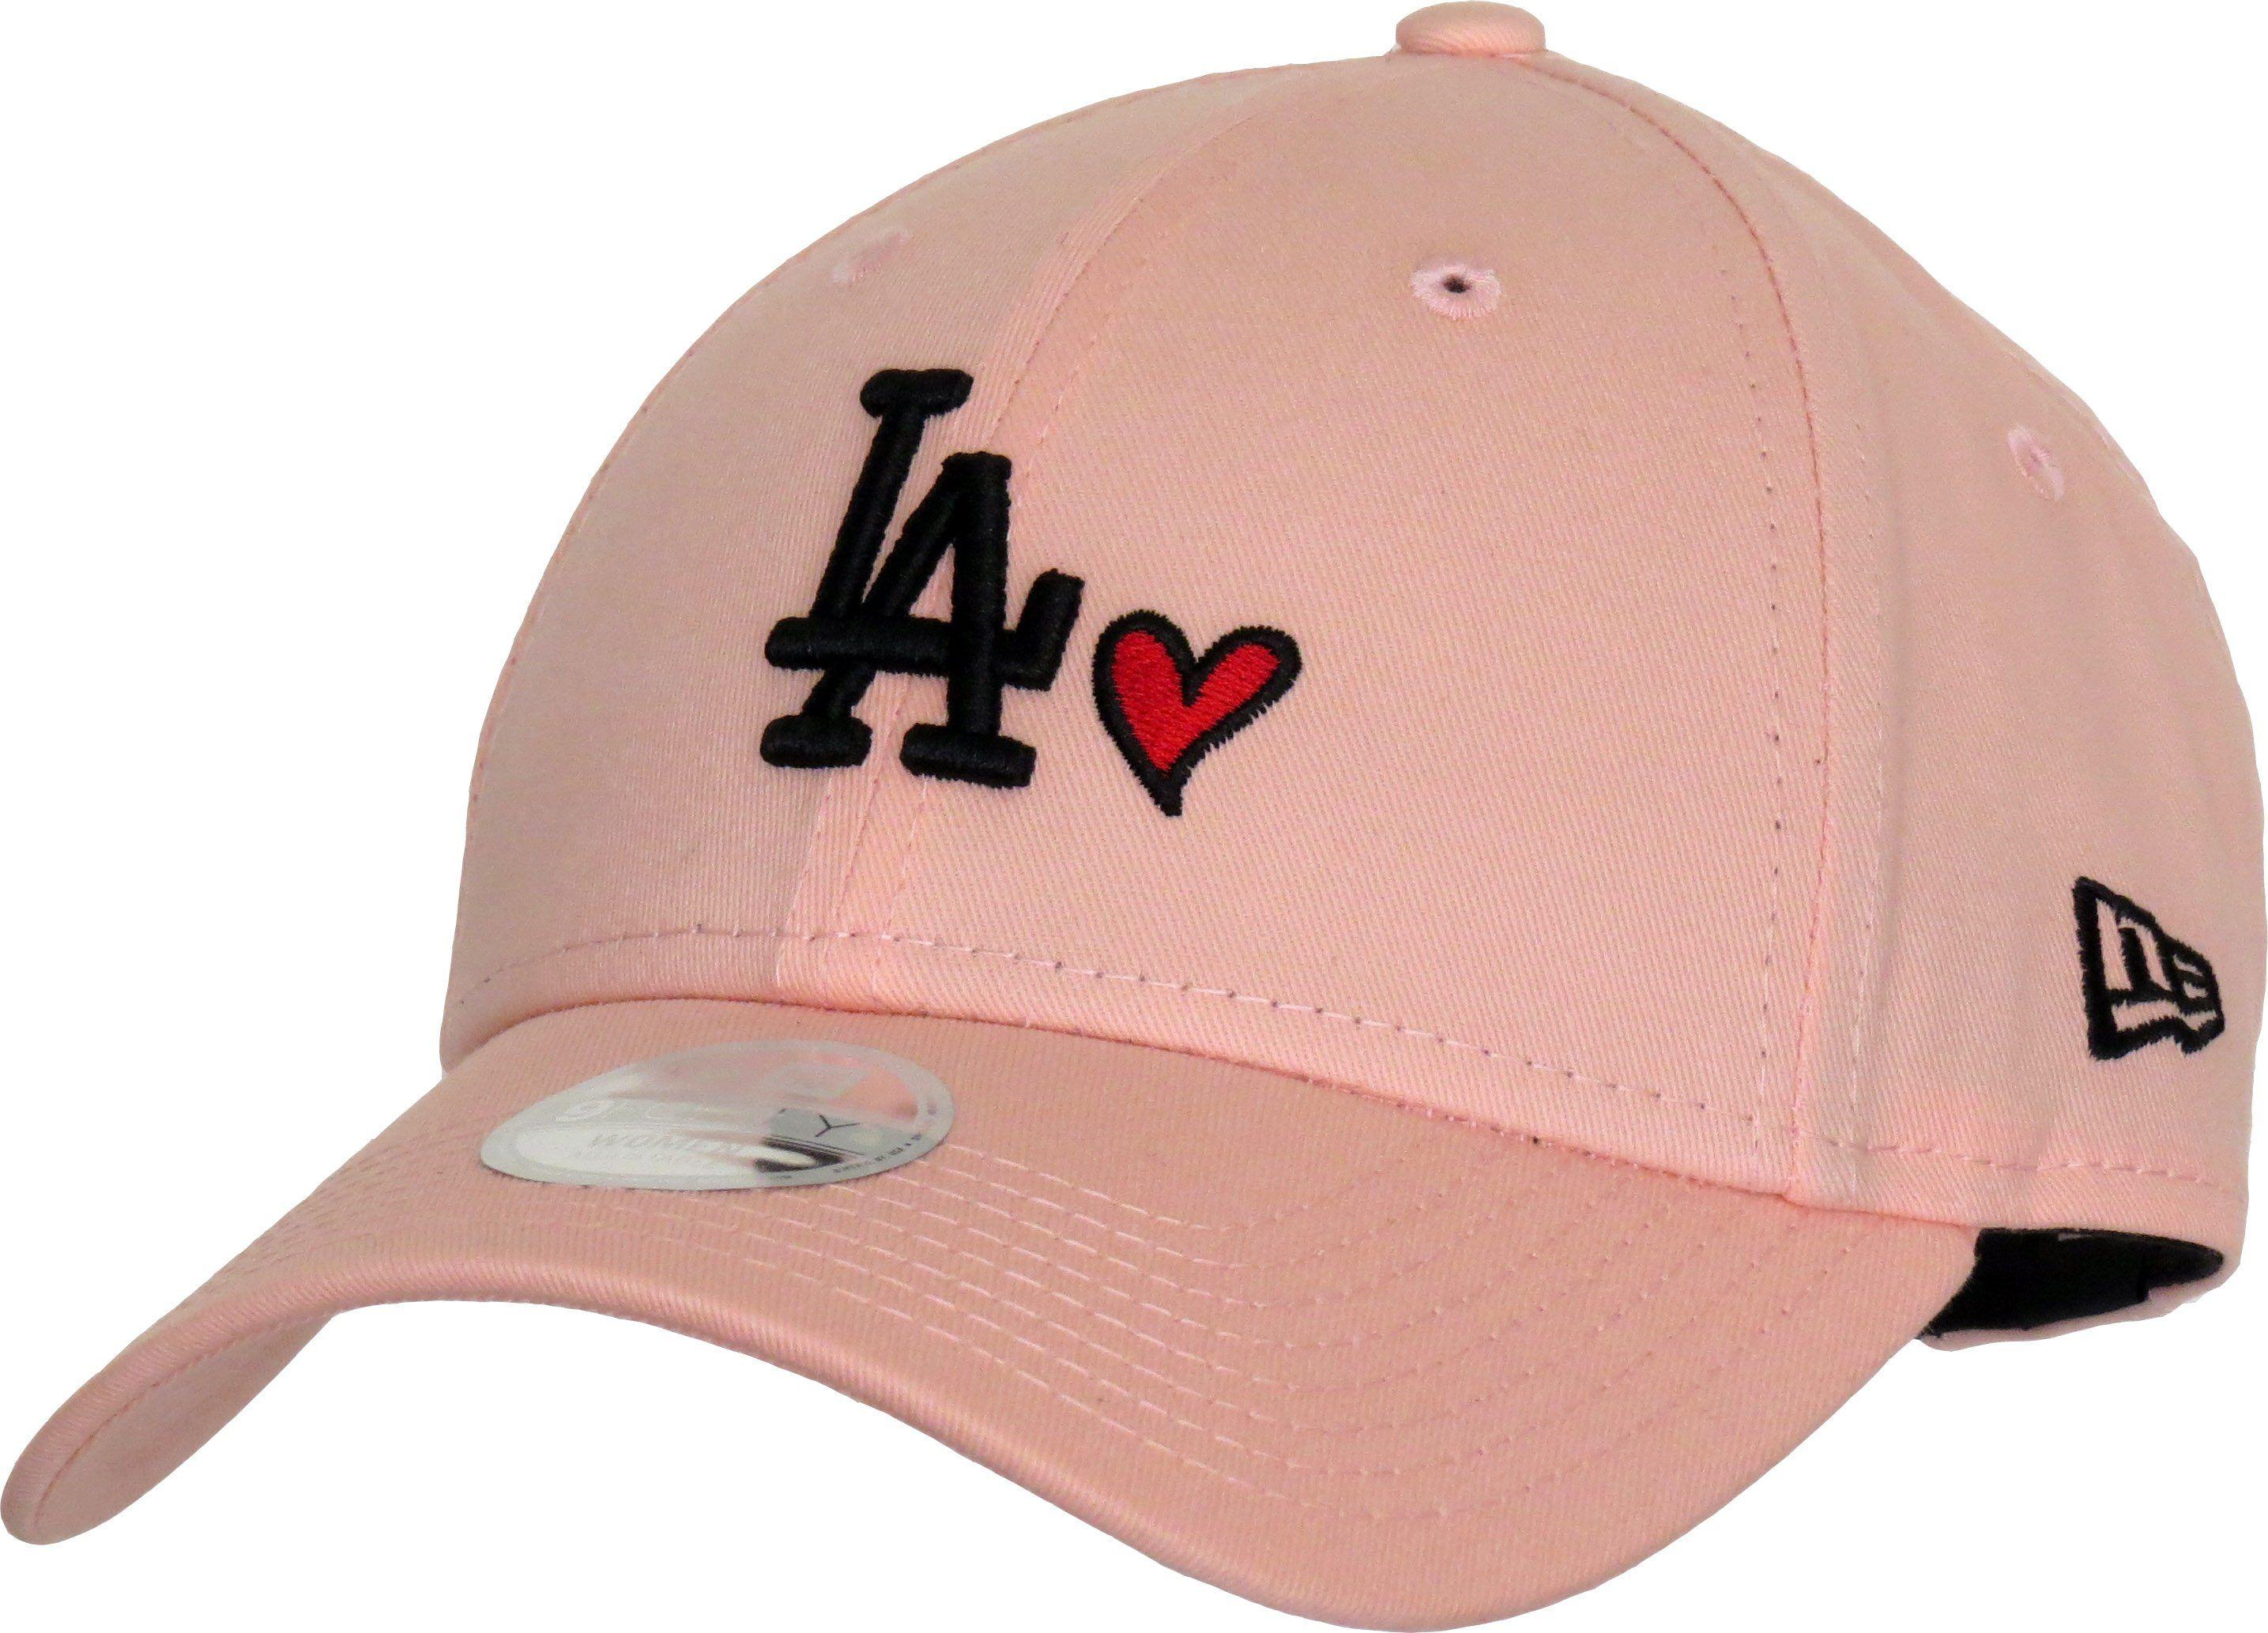 La heart womens new era 940 pink baseball cap pink